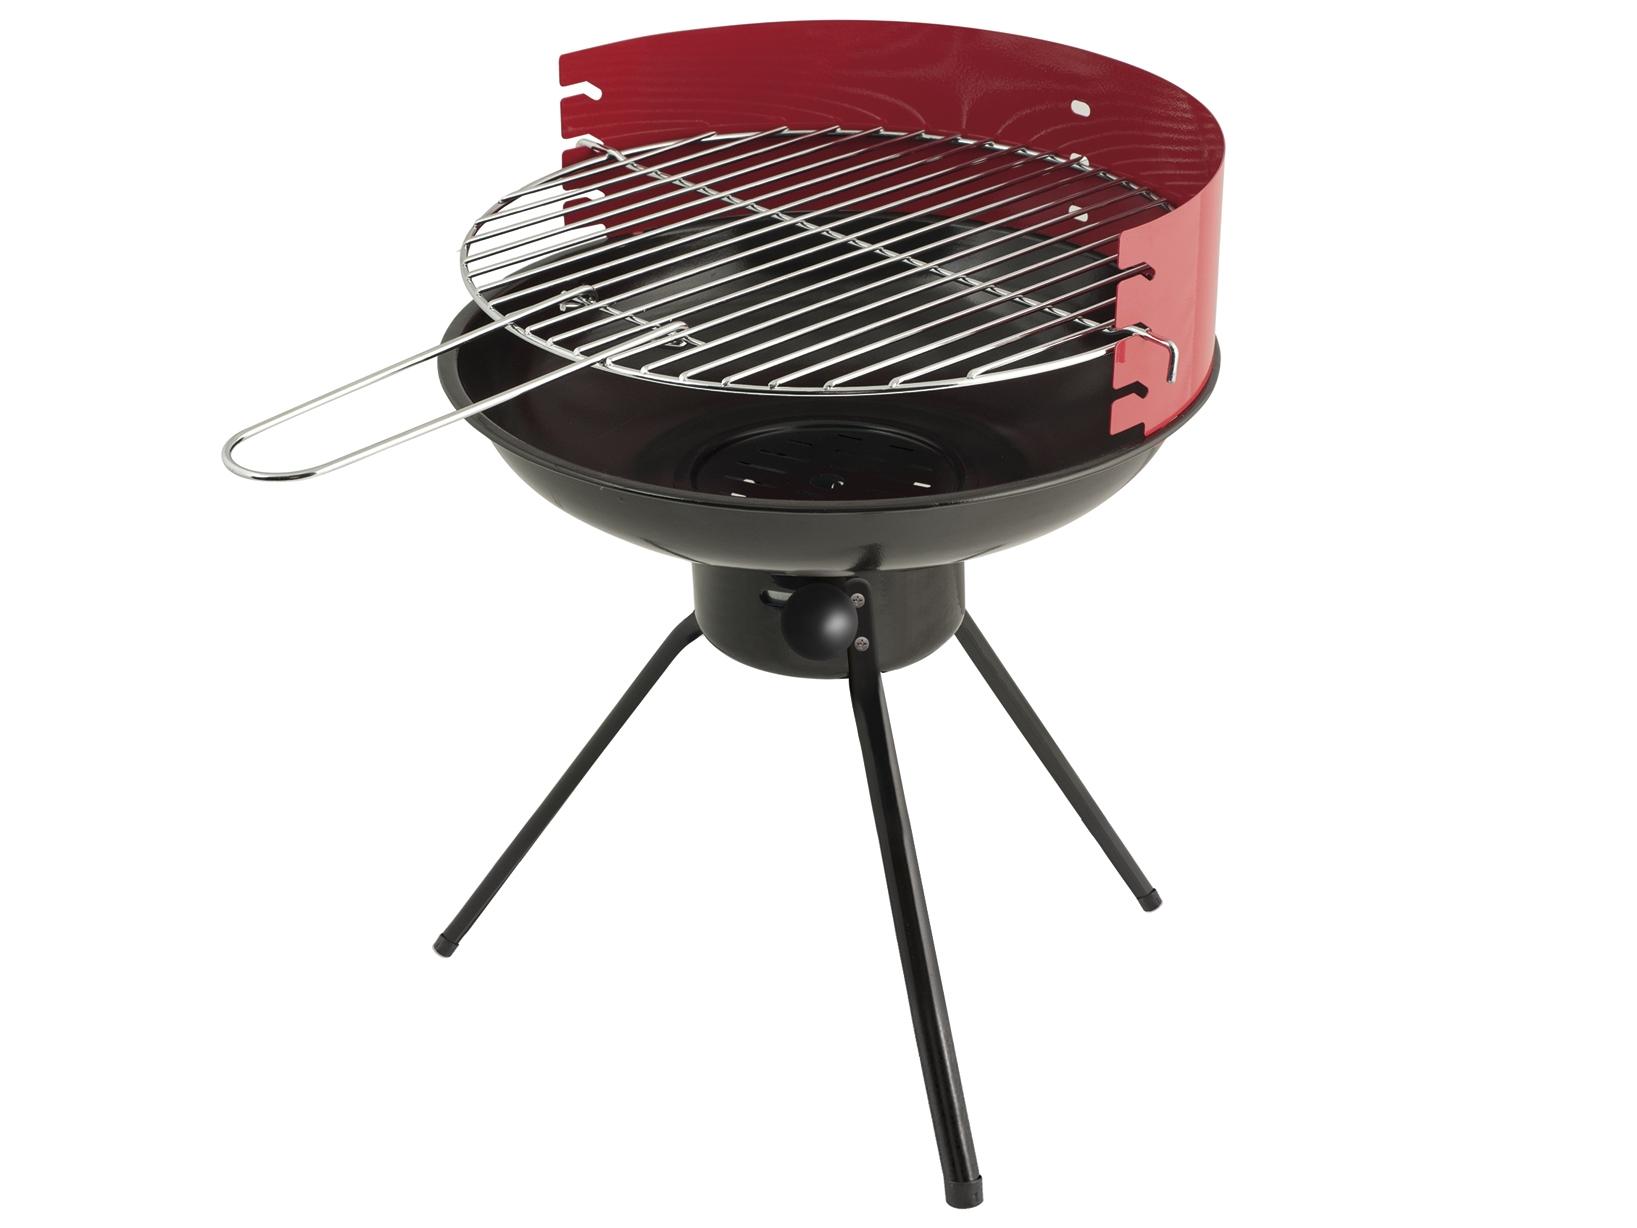 Acquista Barbecue Carbone Tondo Cm40h47 17527596 | Glooke.com